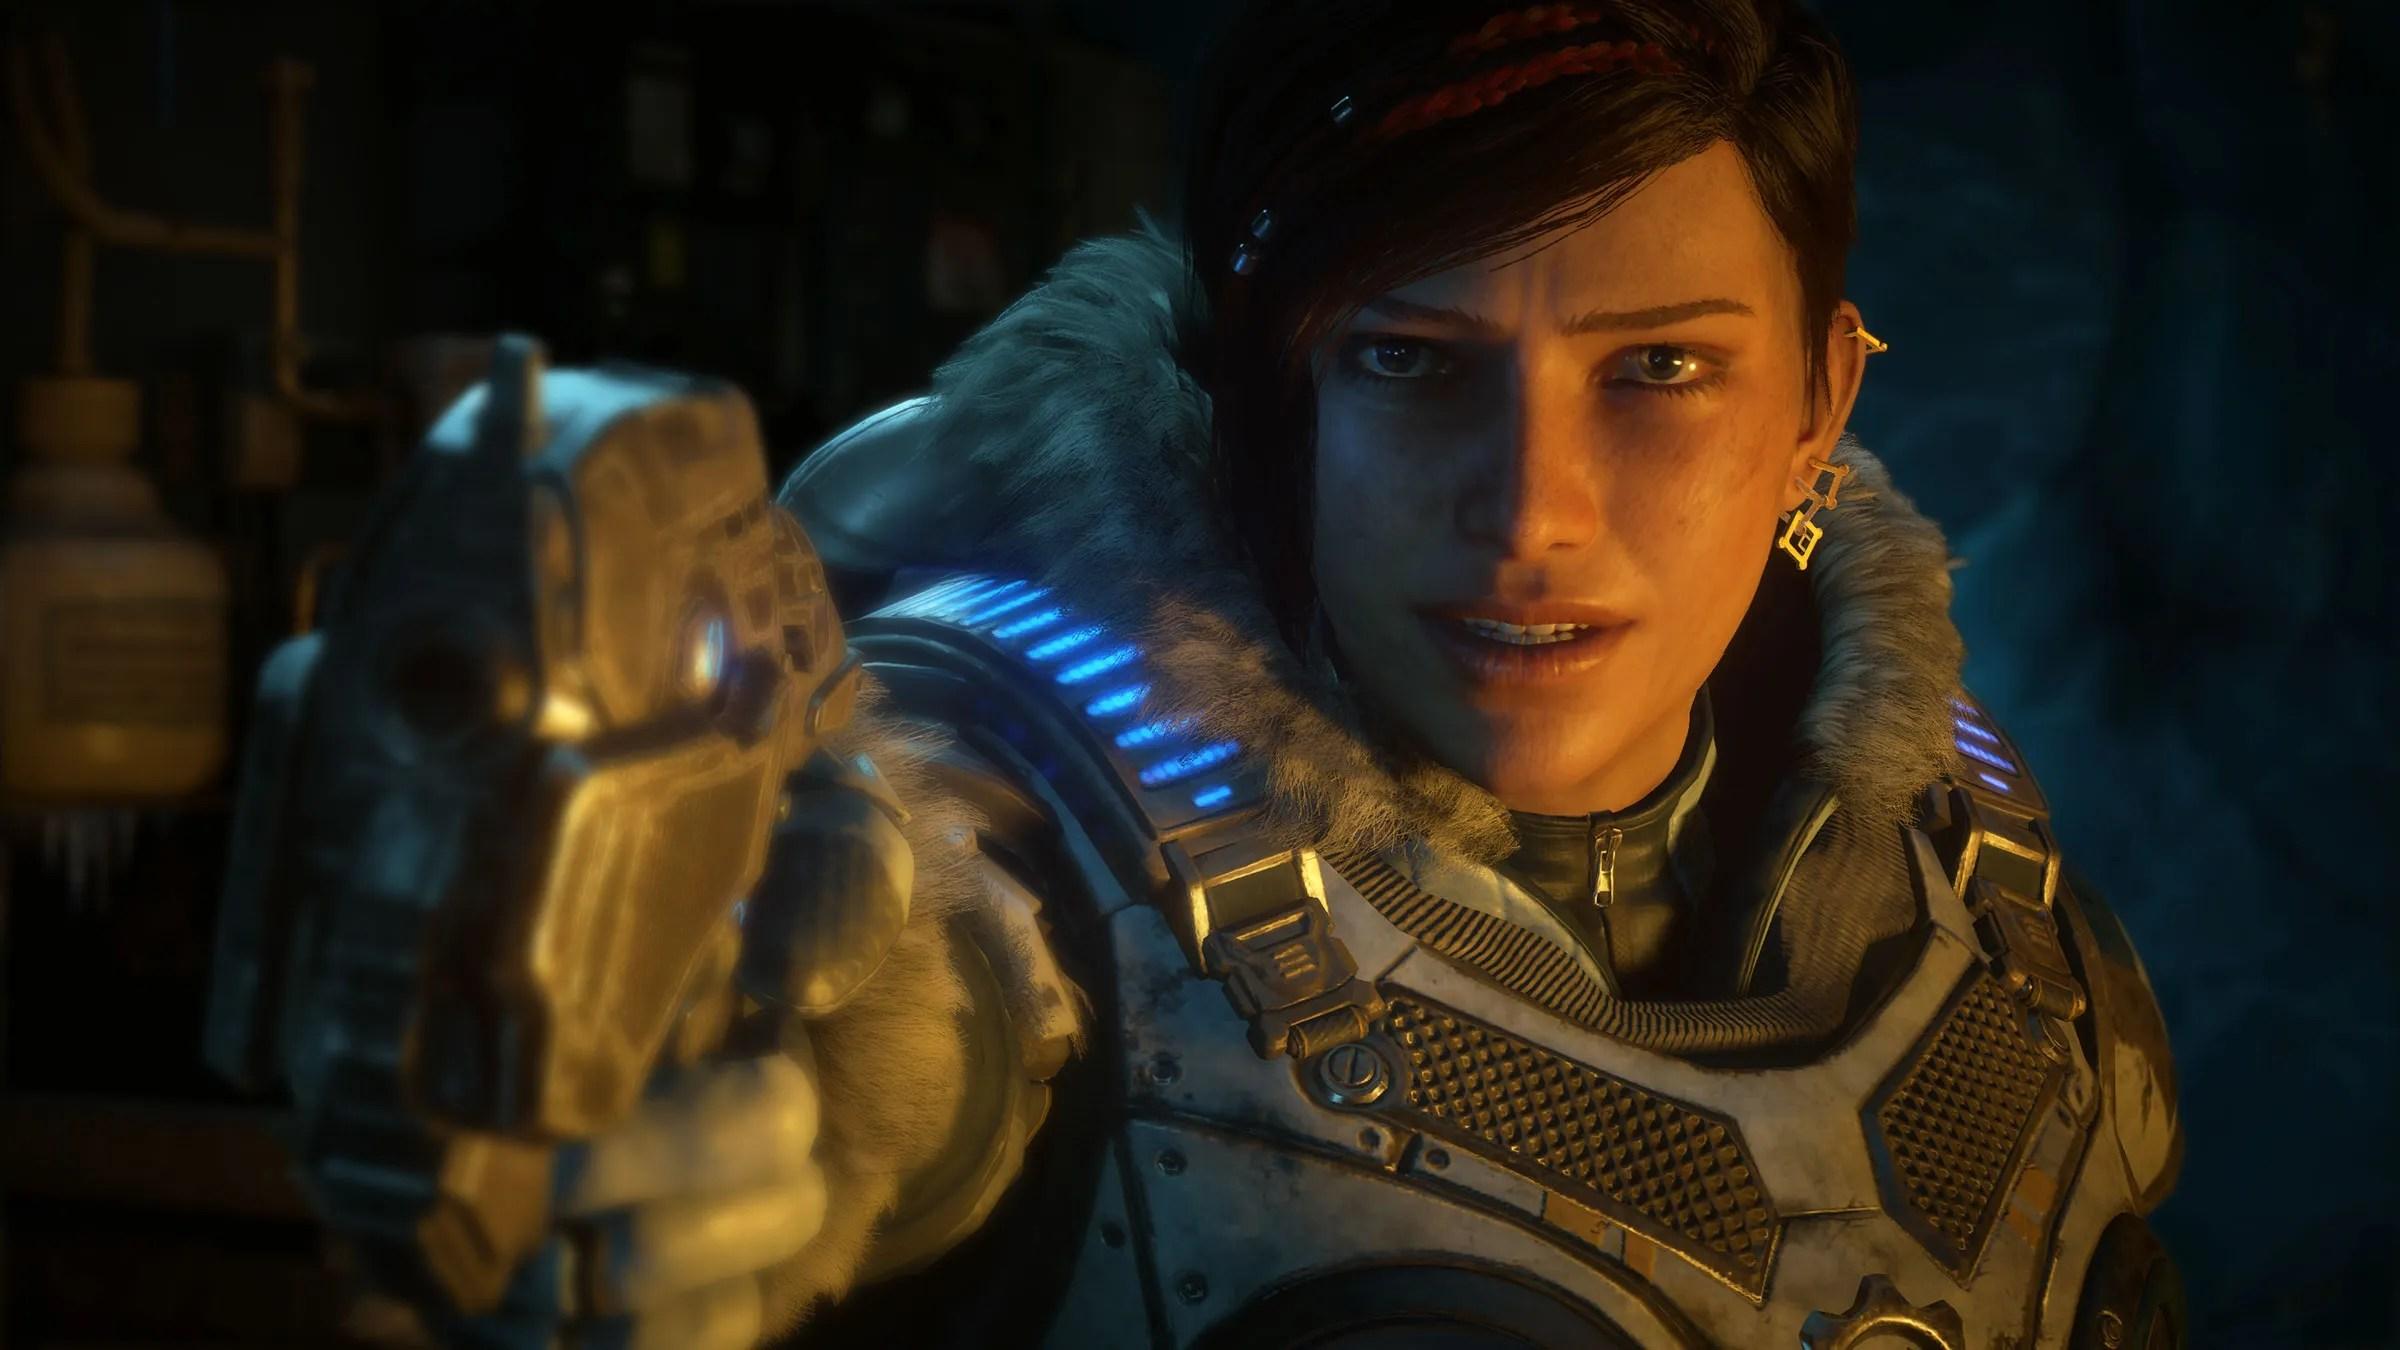 female representation in videogames